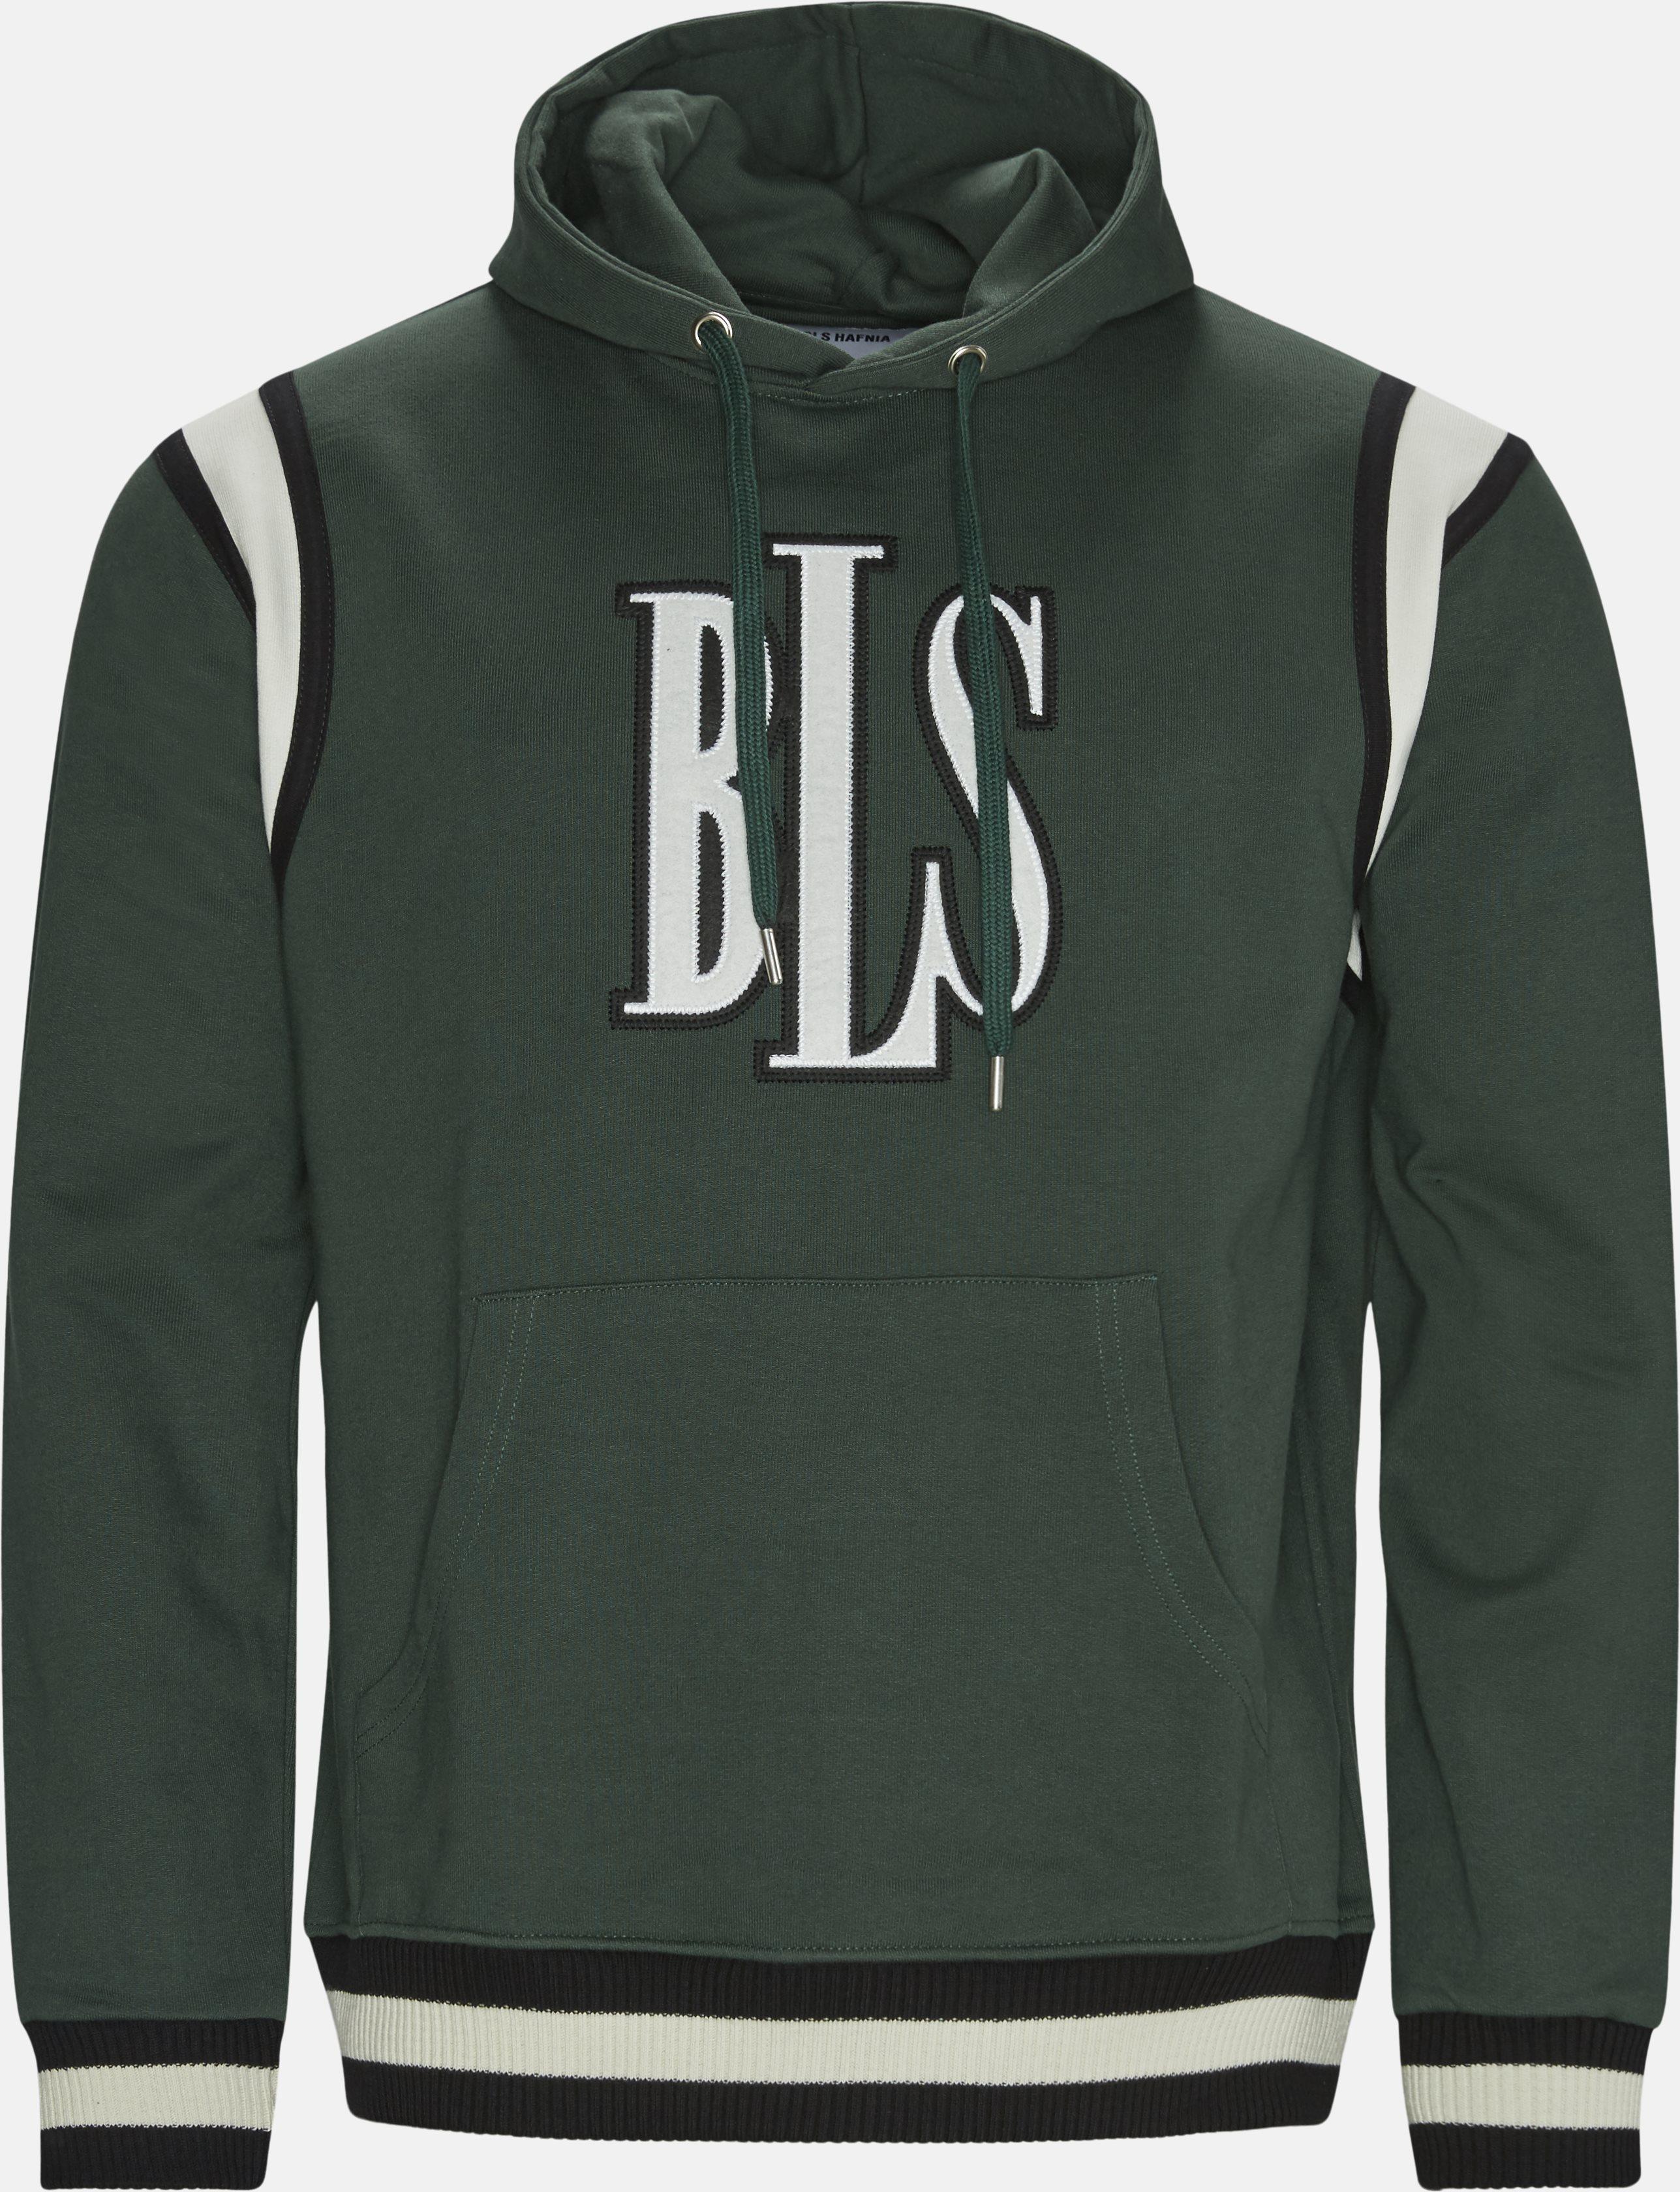 Sweatshirts - Regular fit - Green